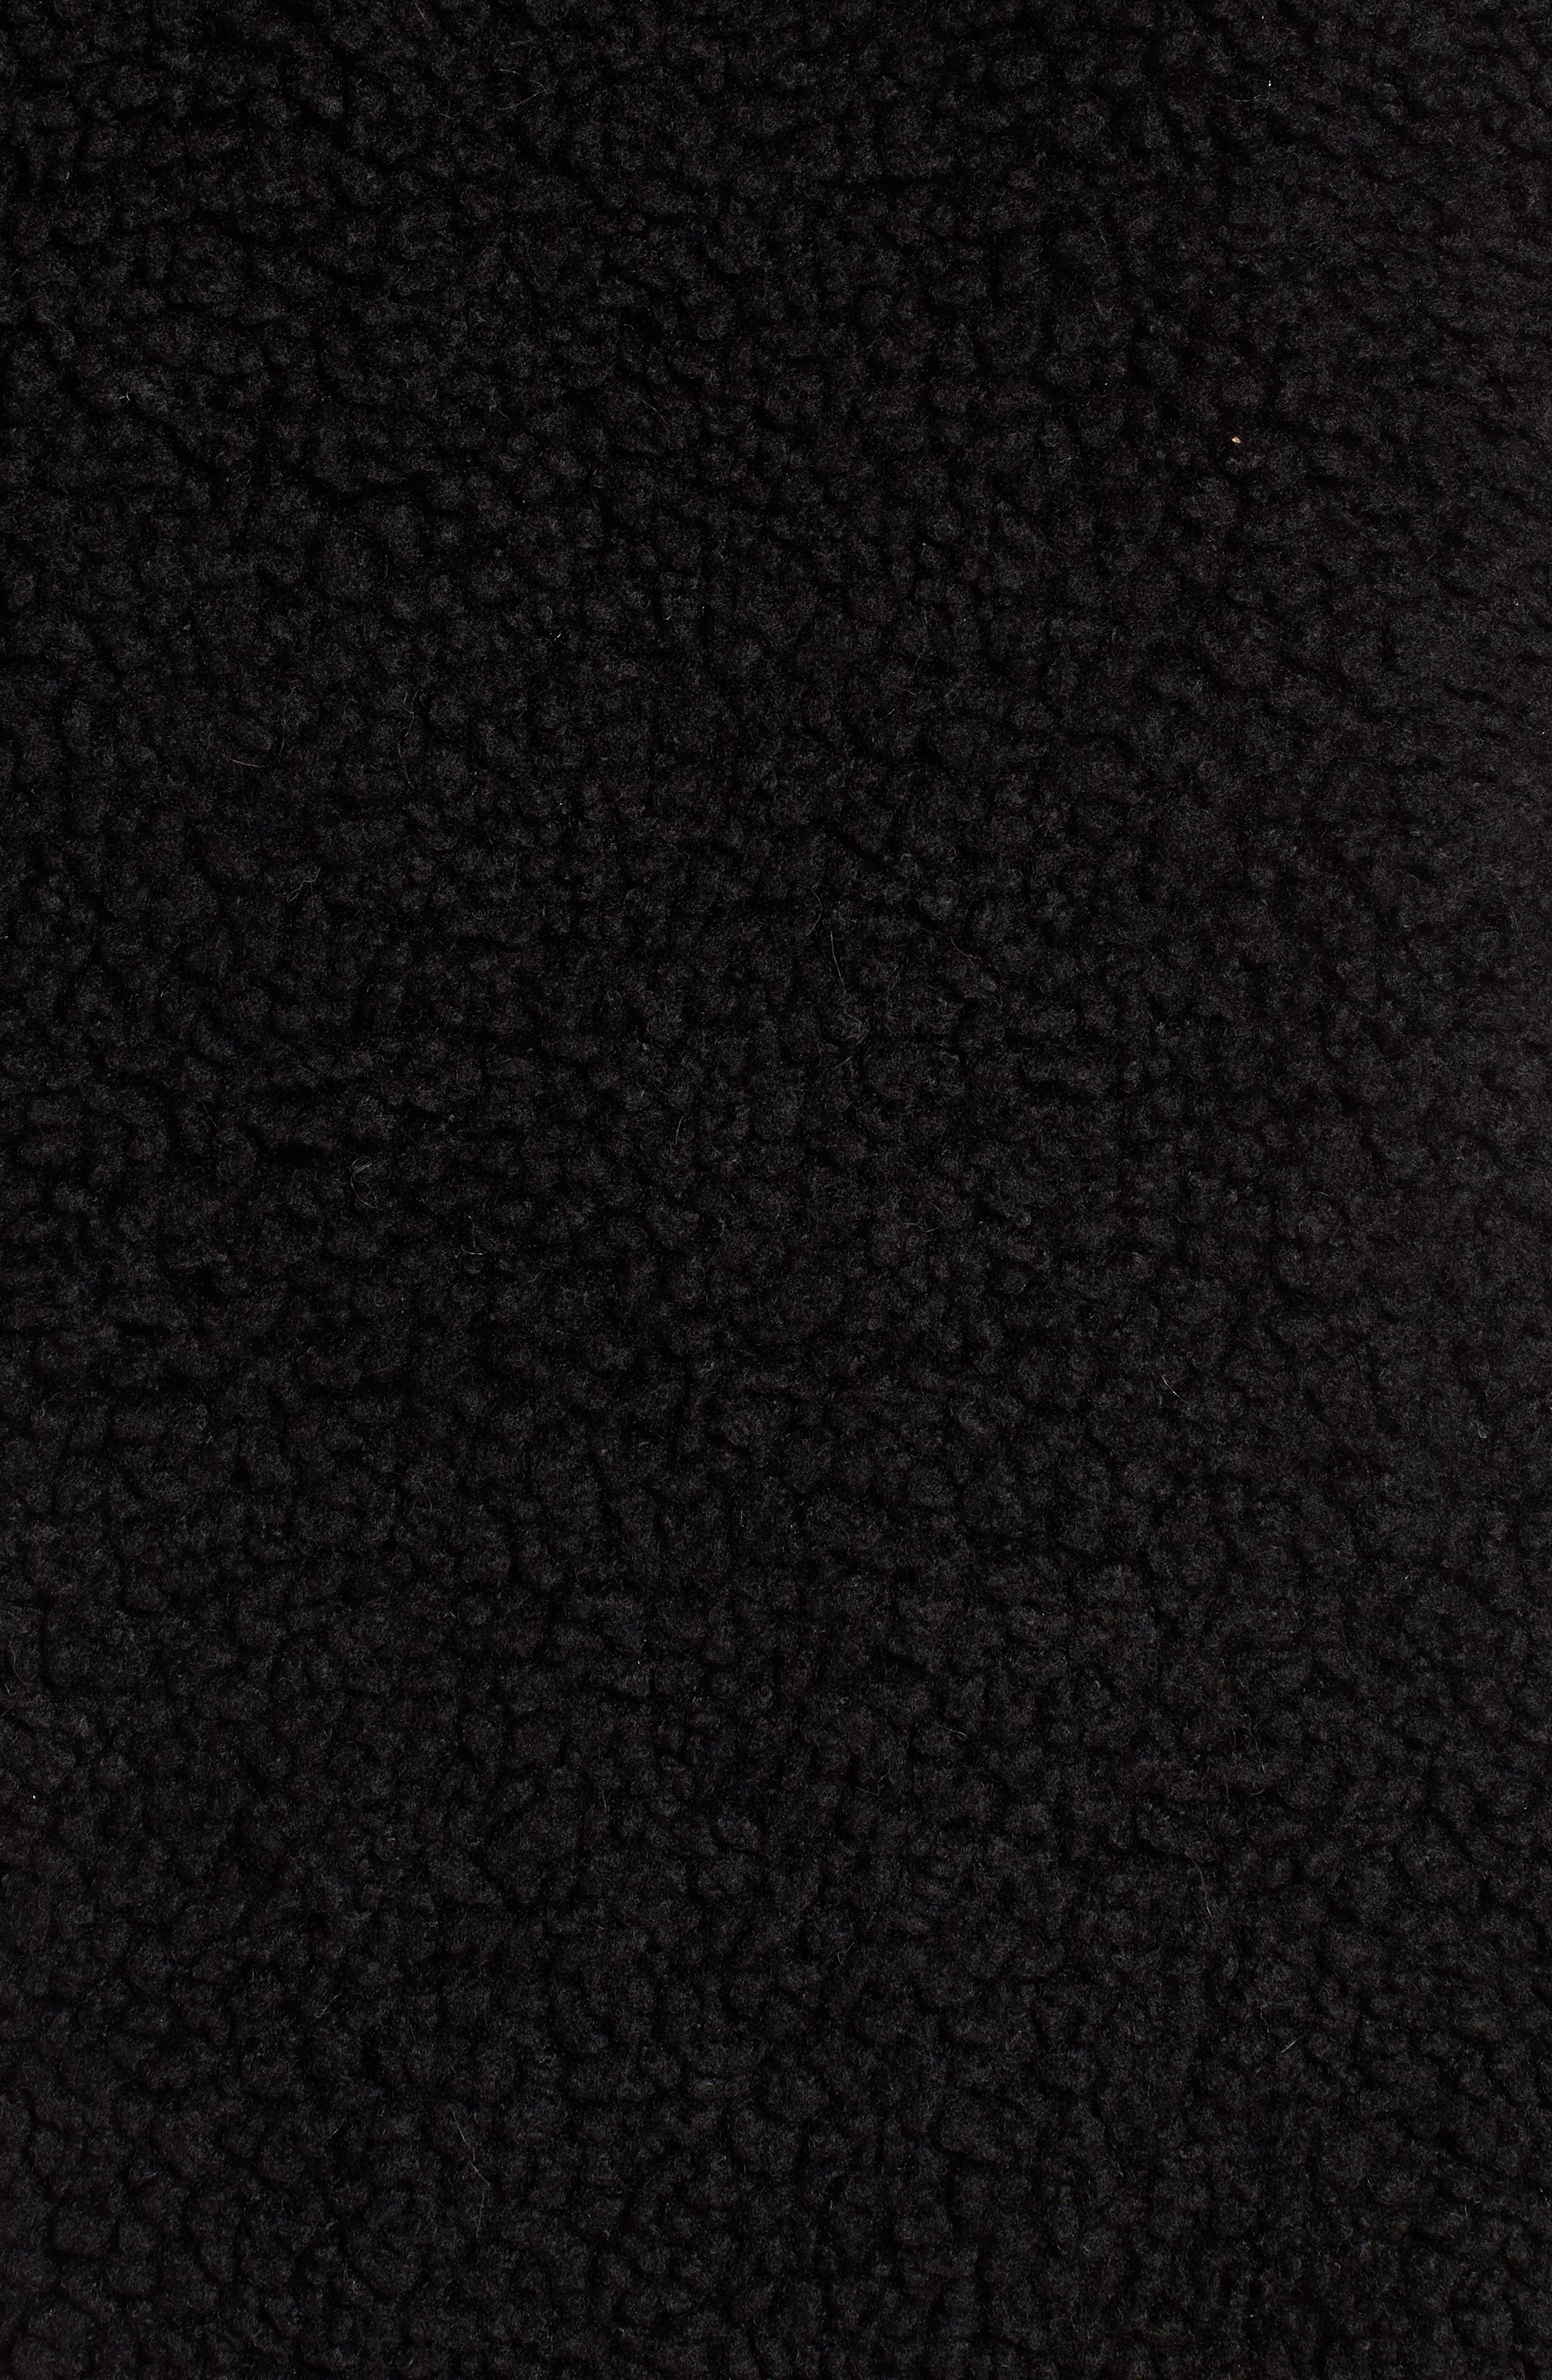 Faux Shearling Hooded Vest,                             Alternate thumbnail 5, color,                             BLACK